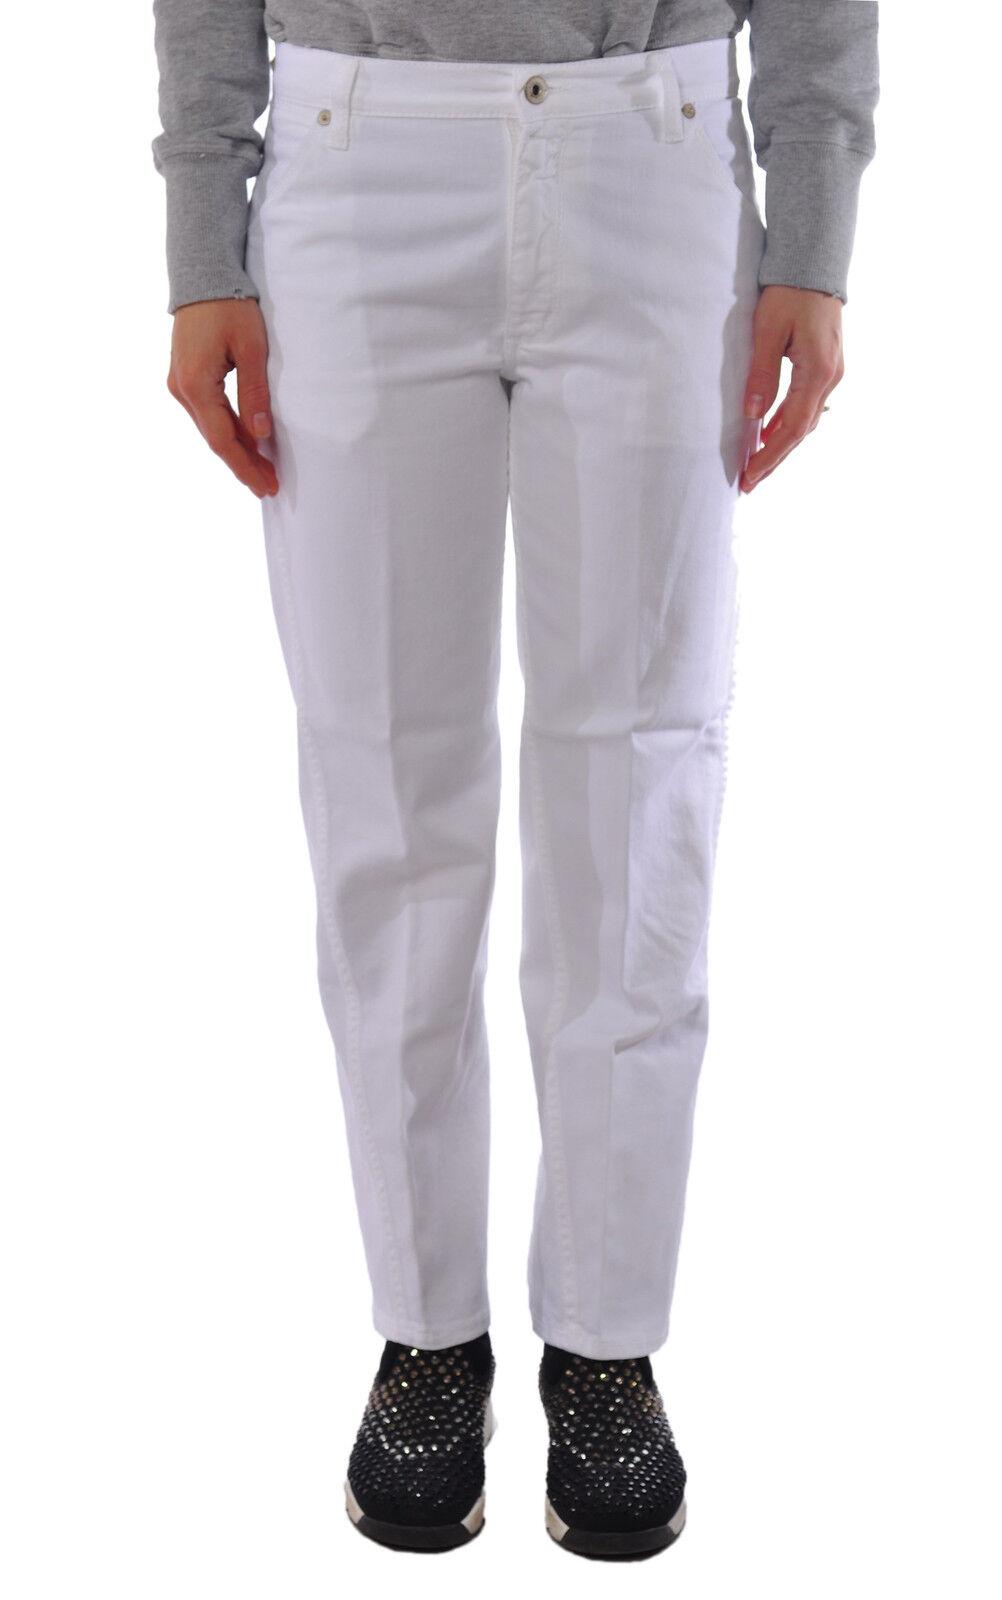 Dondup  -  Pants - Female - 28 - White - 1321604B162419